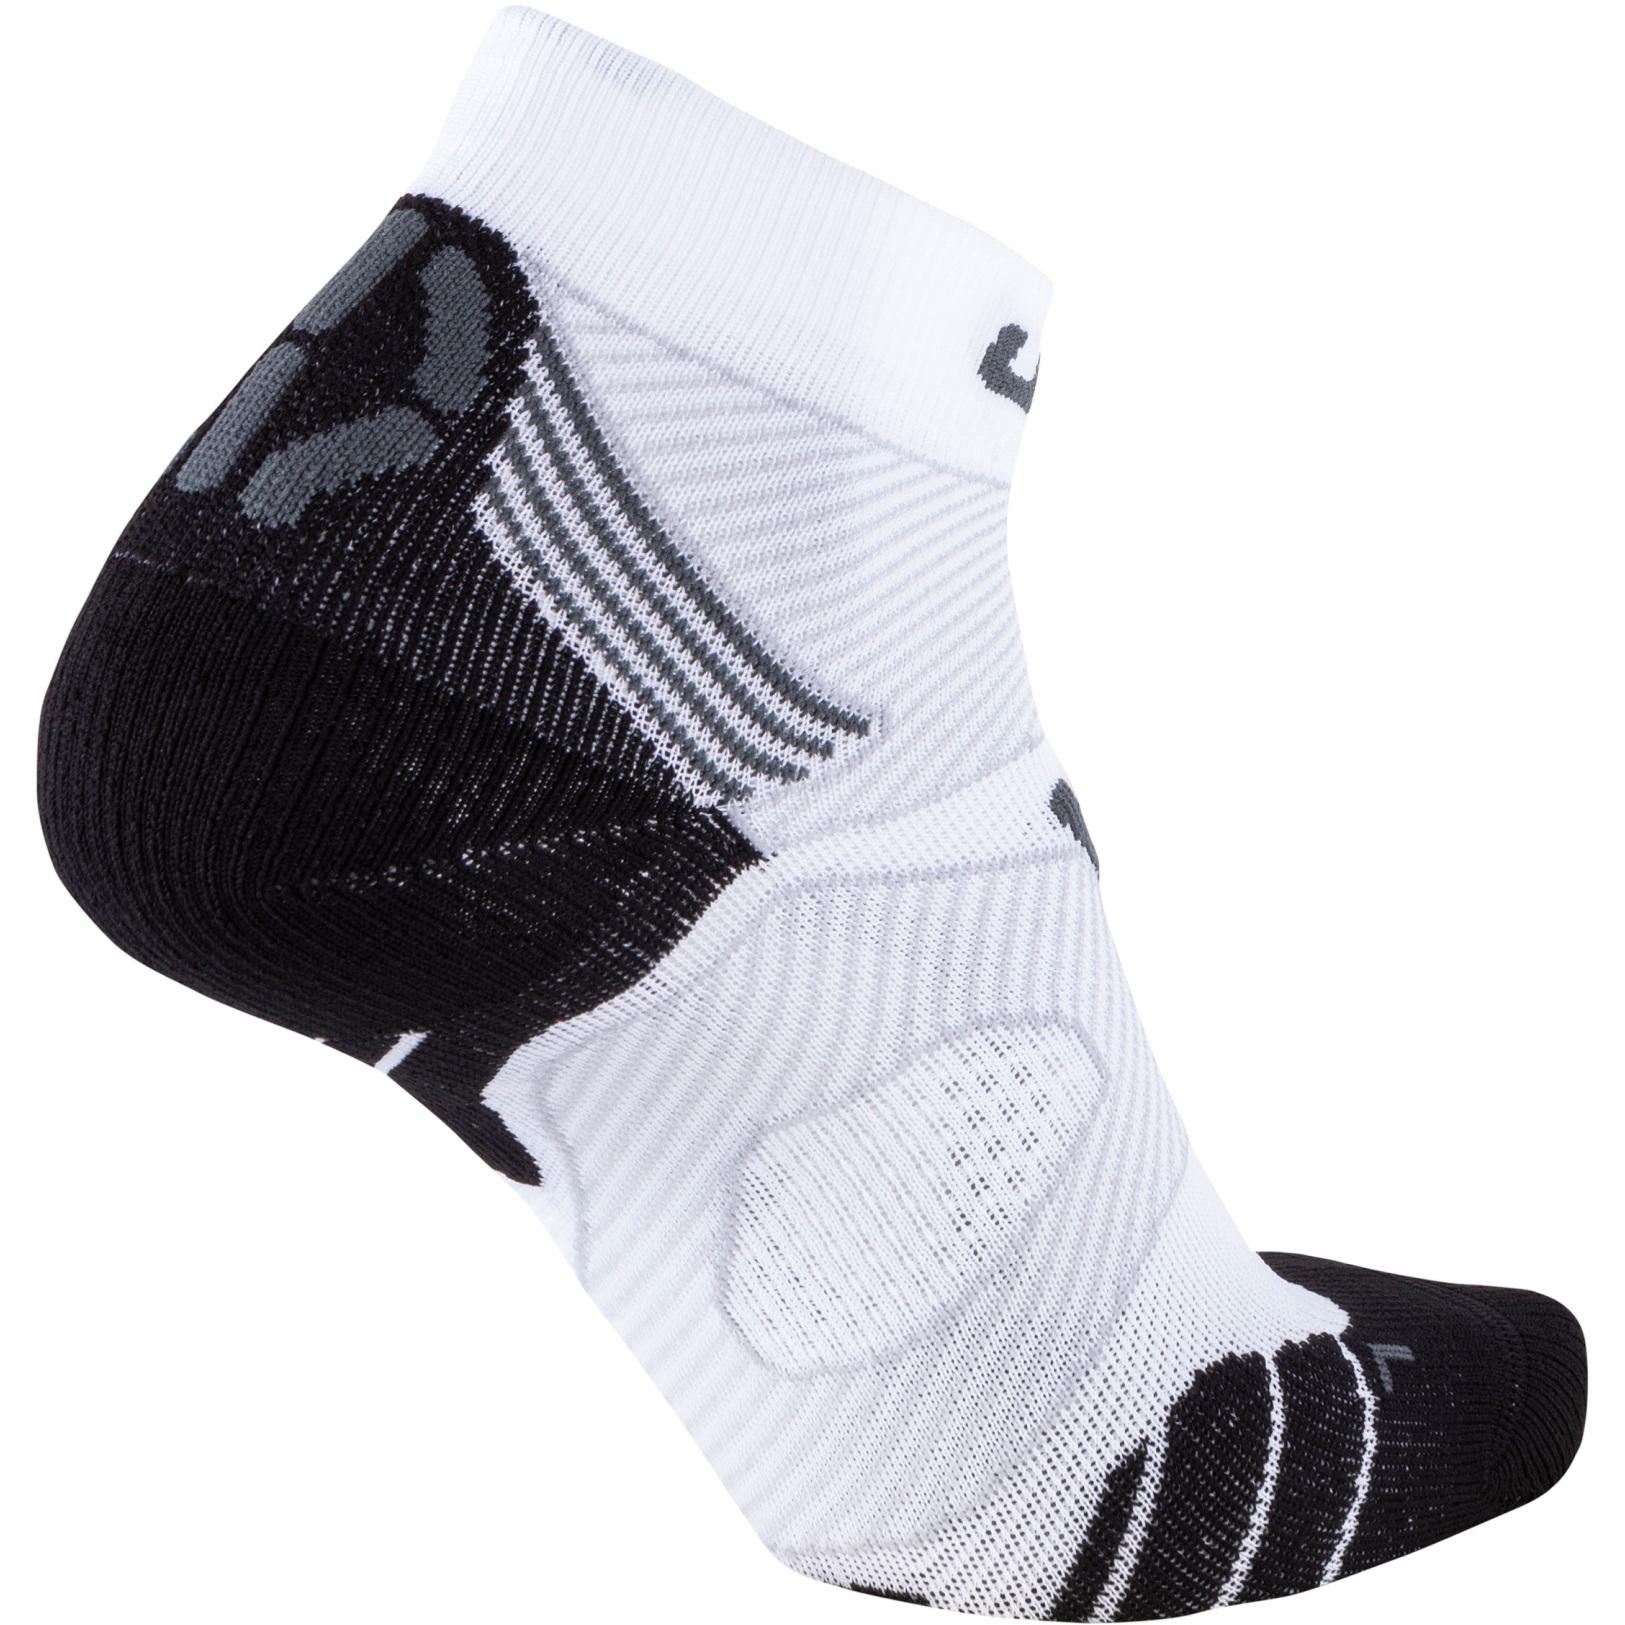 Image of UYN Marathon Zero Men's Running Socks - White/Grey